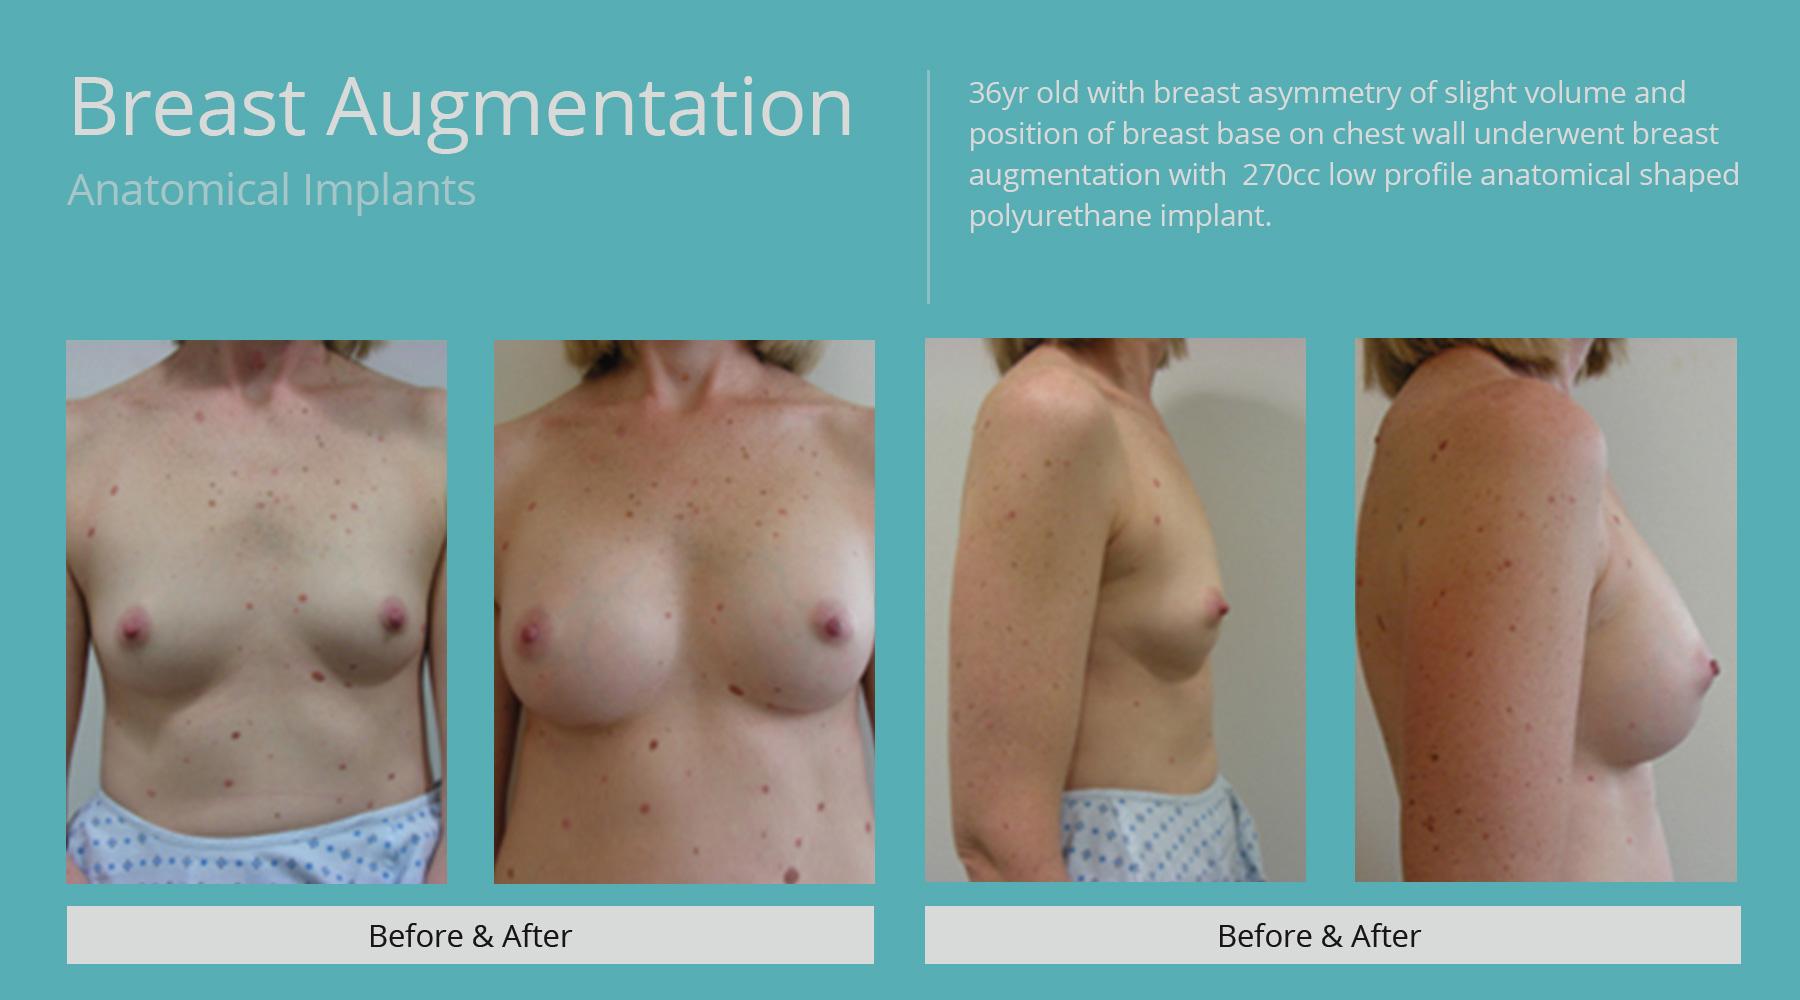 Breast-Augmentation-anatomical-9